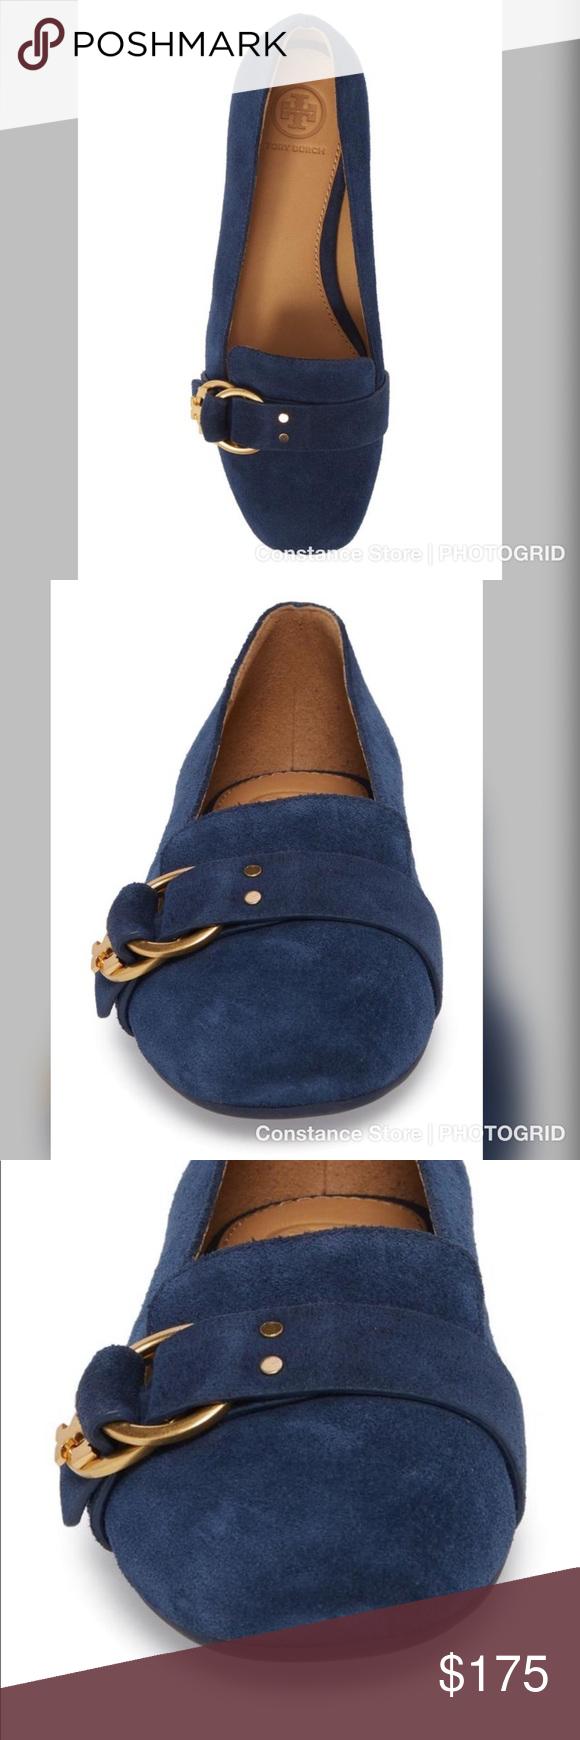 449705b98 Tory Burch Marsden Loafer Women Size 10M NIB - Round toe - Metal accent at  vamp